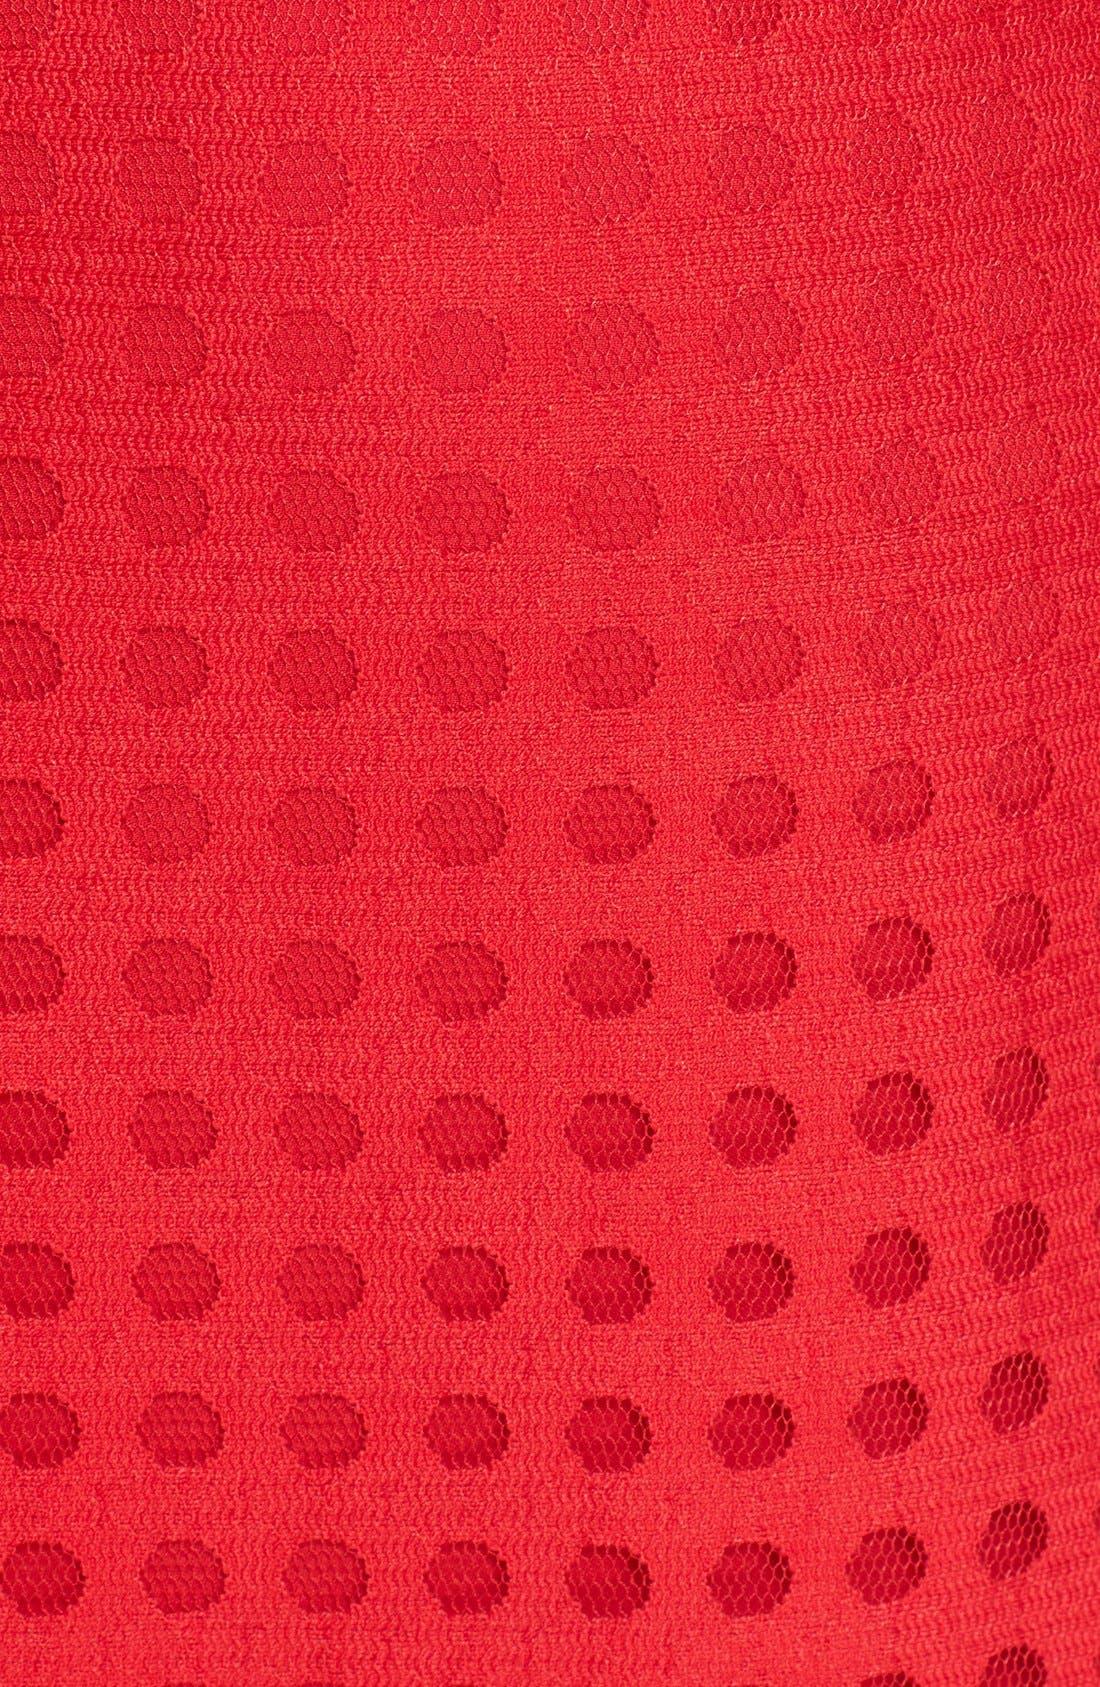 Mesh Pencil Skirt,                             Alternate thumbnail 6, color,                             600